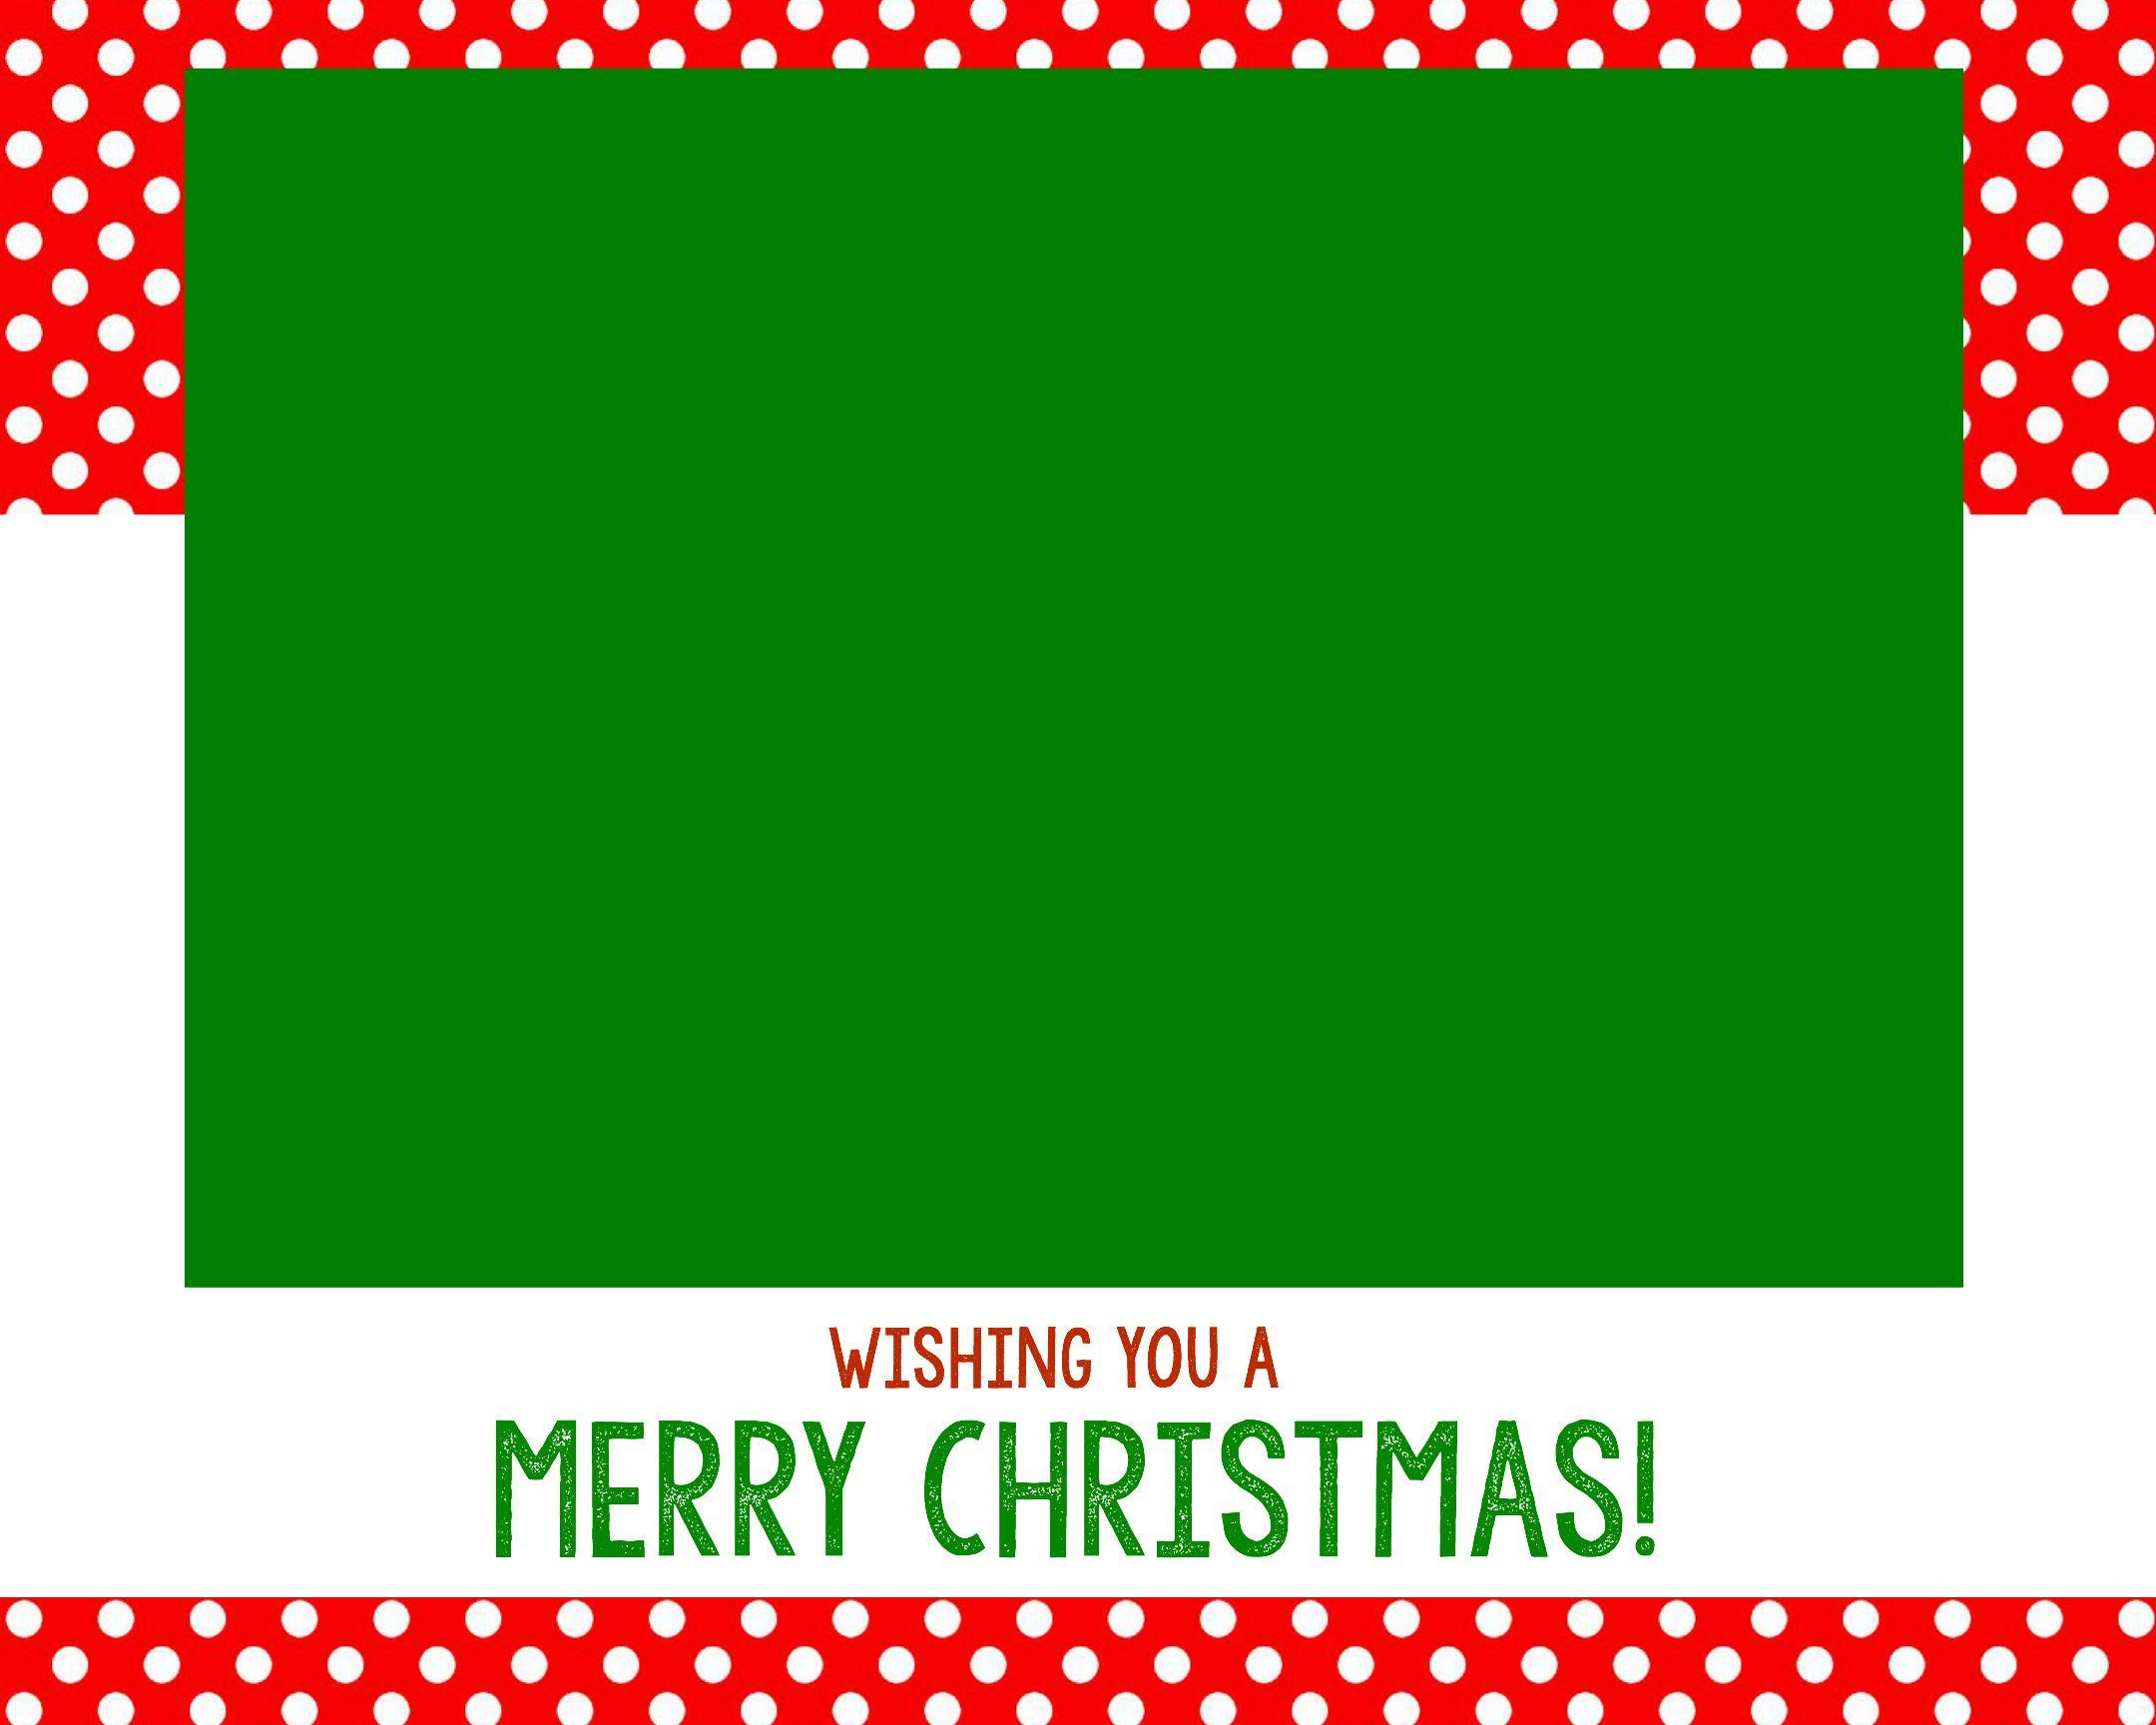 Free Christmas Card Templates Christmas card template